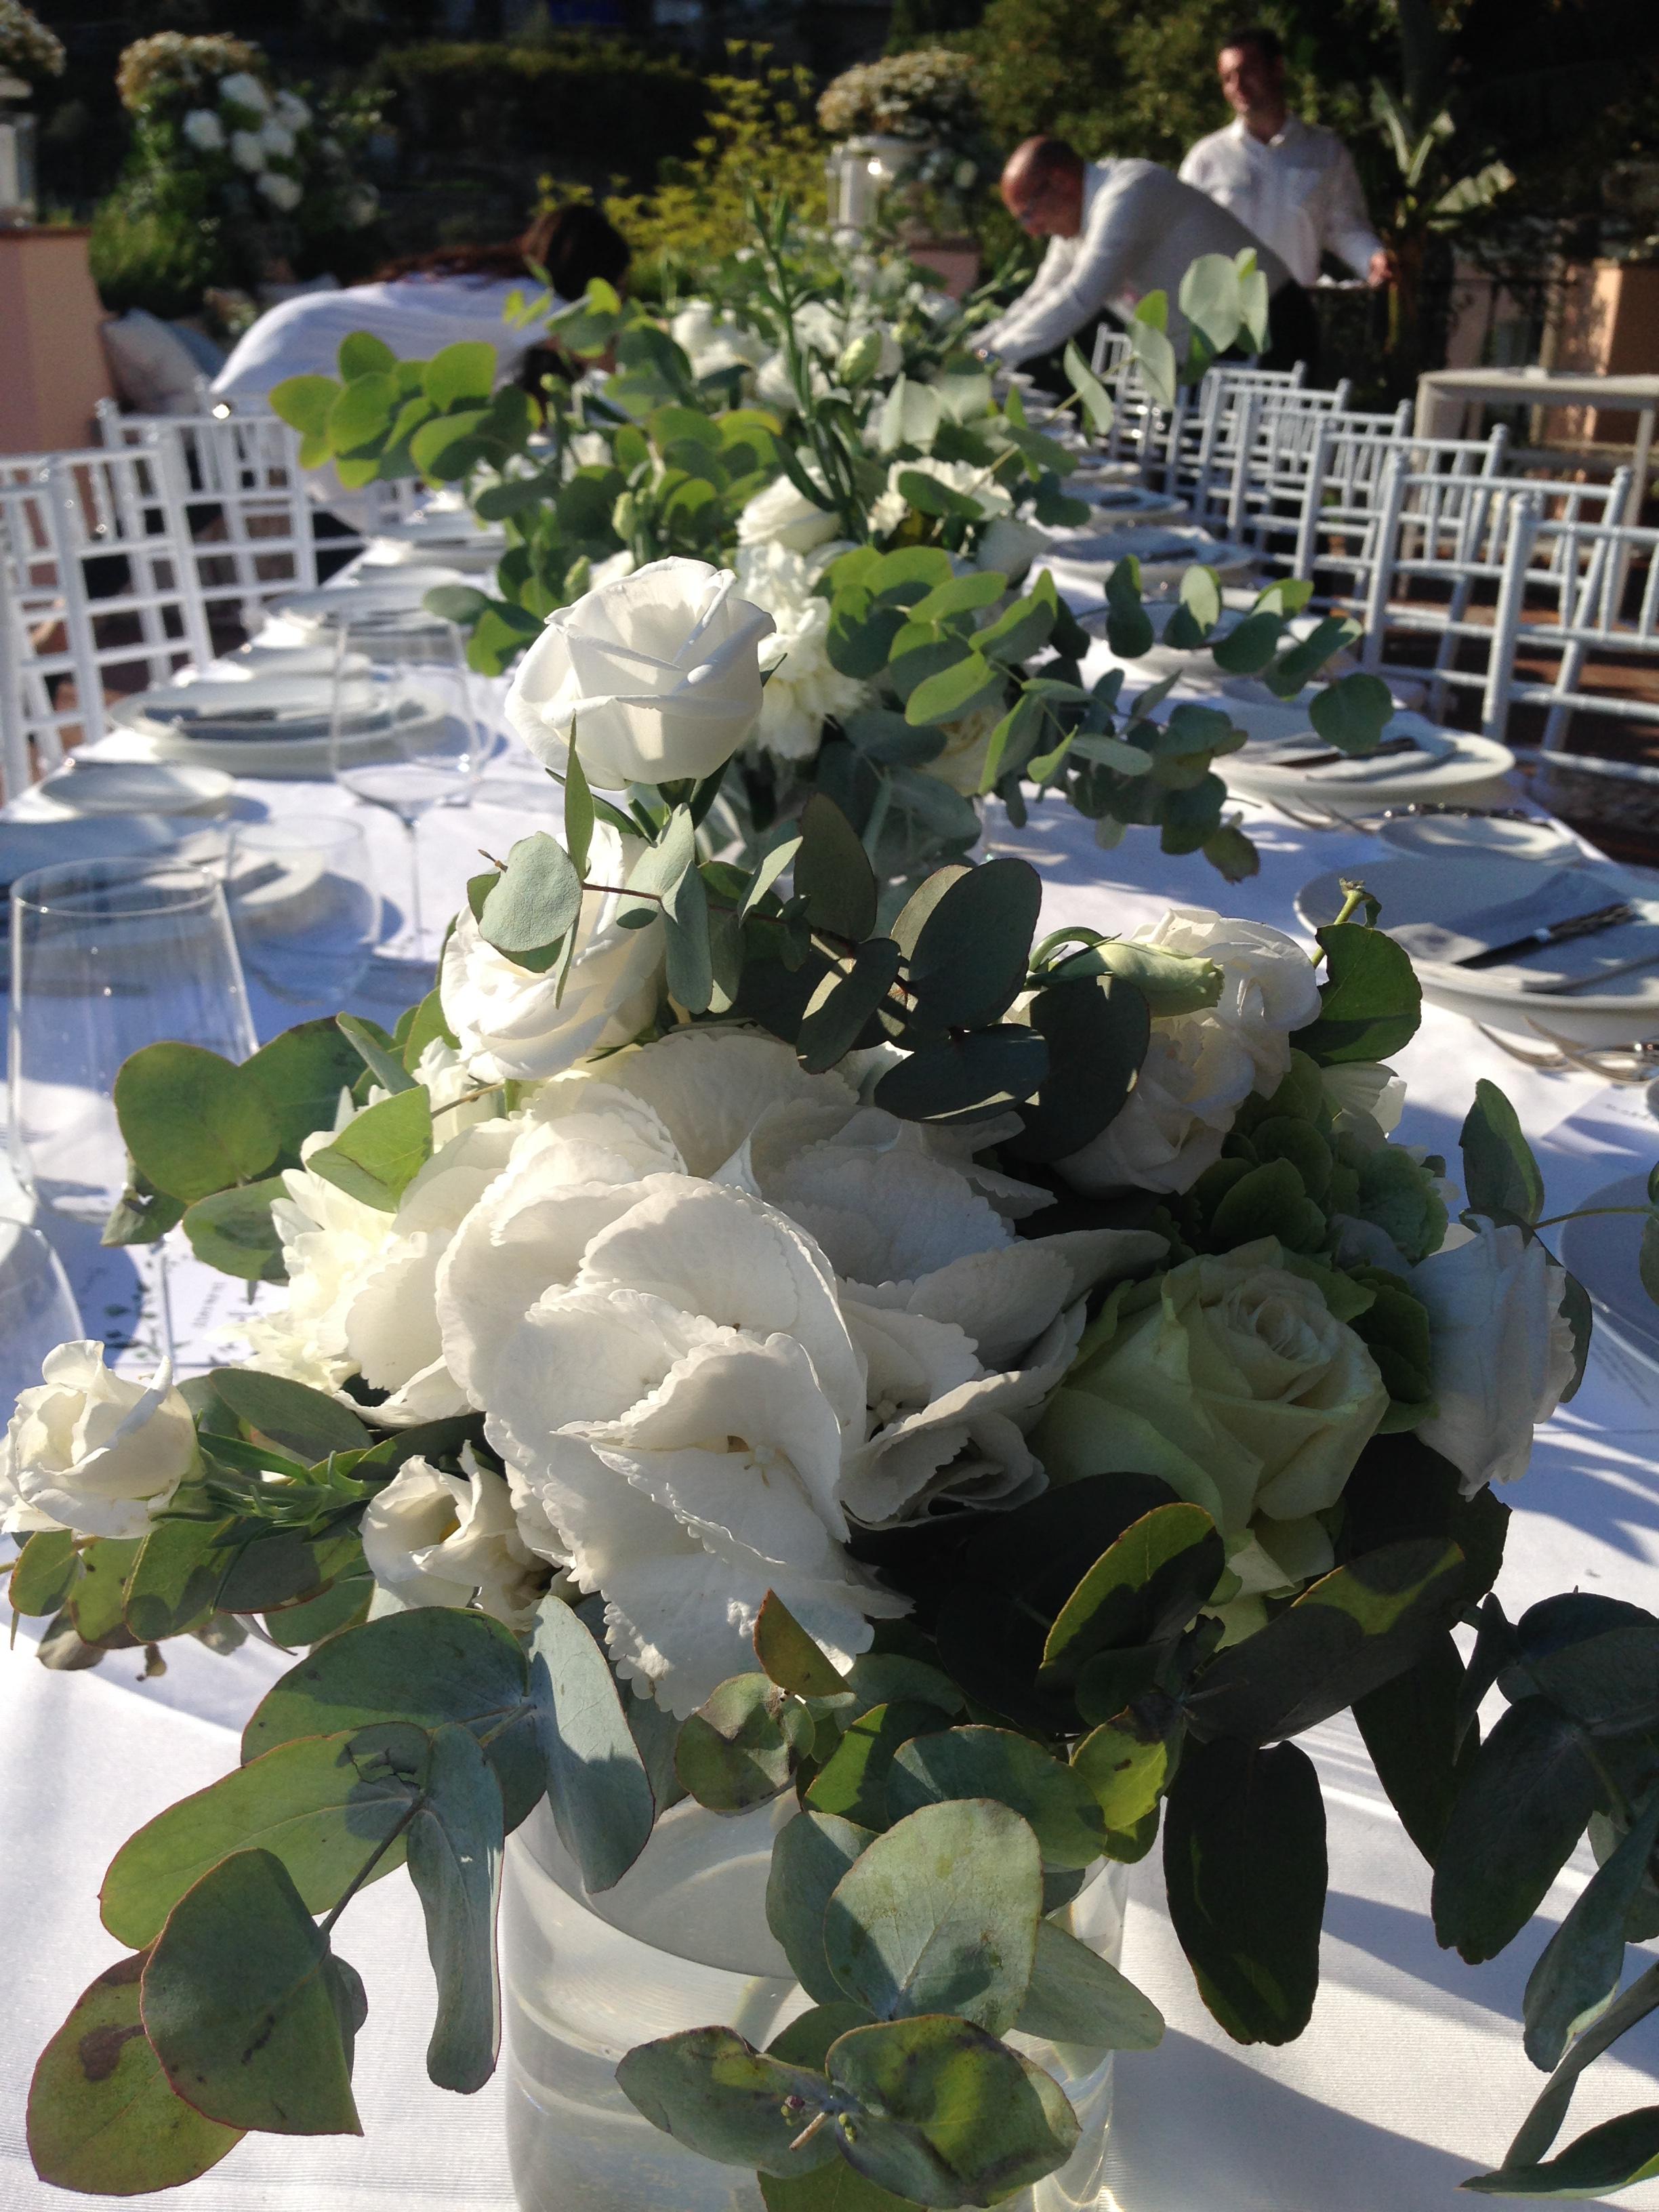 https://www.weddingamalfi.com/wp-content/uploads/Laura-and-Jarrod-fresh-flowers-wedding-table-decorations.jpg